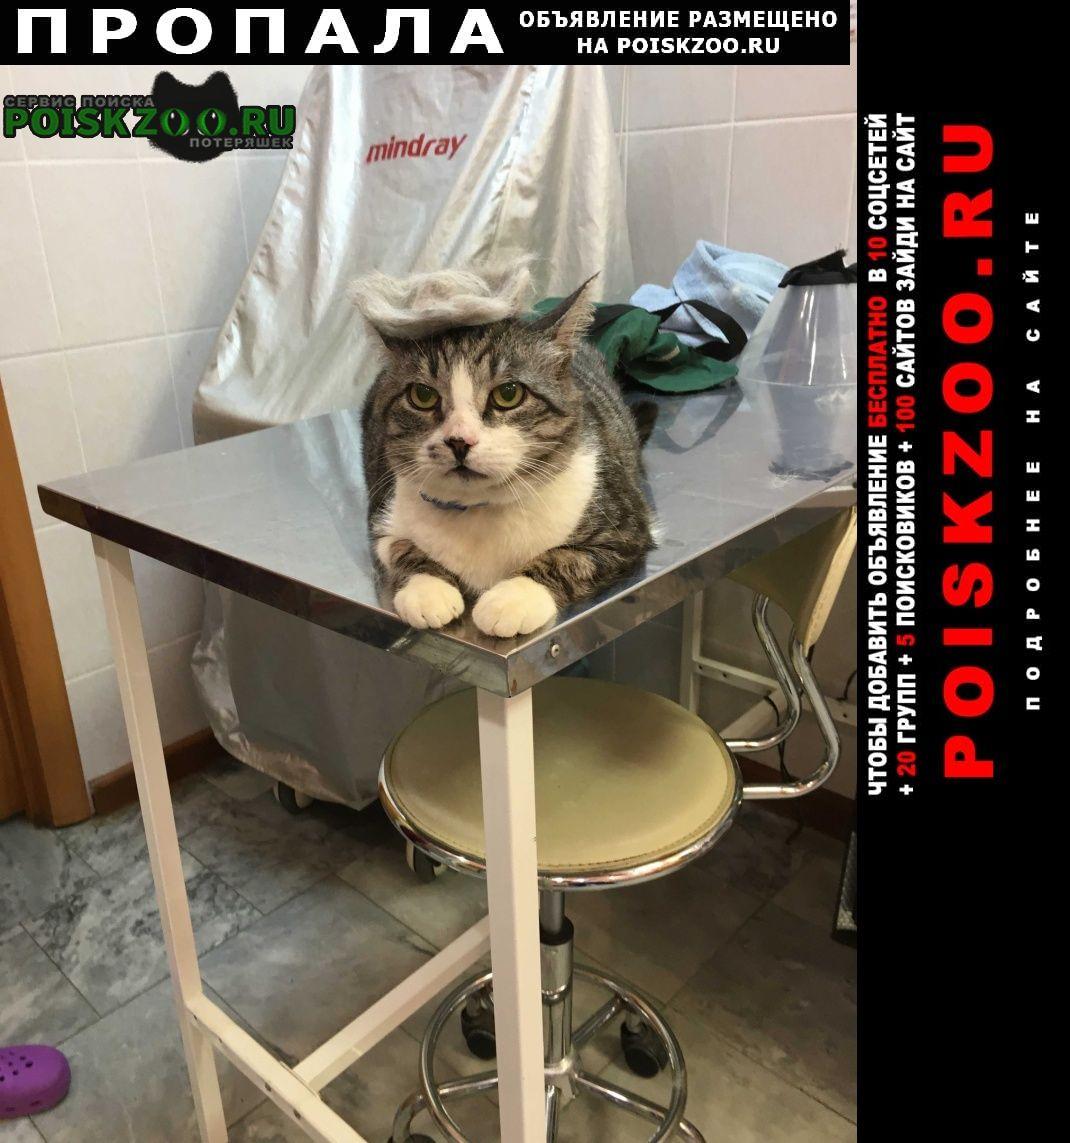 Нижний Новгород Пропал кот